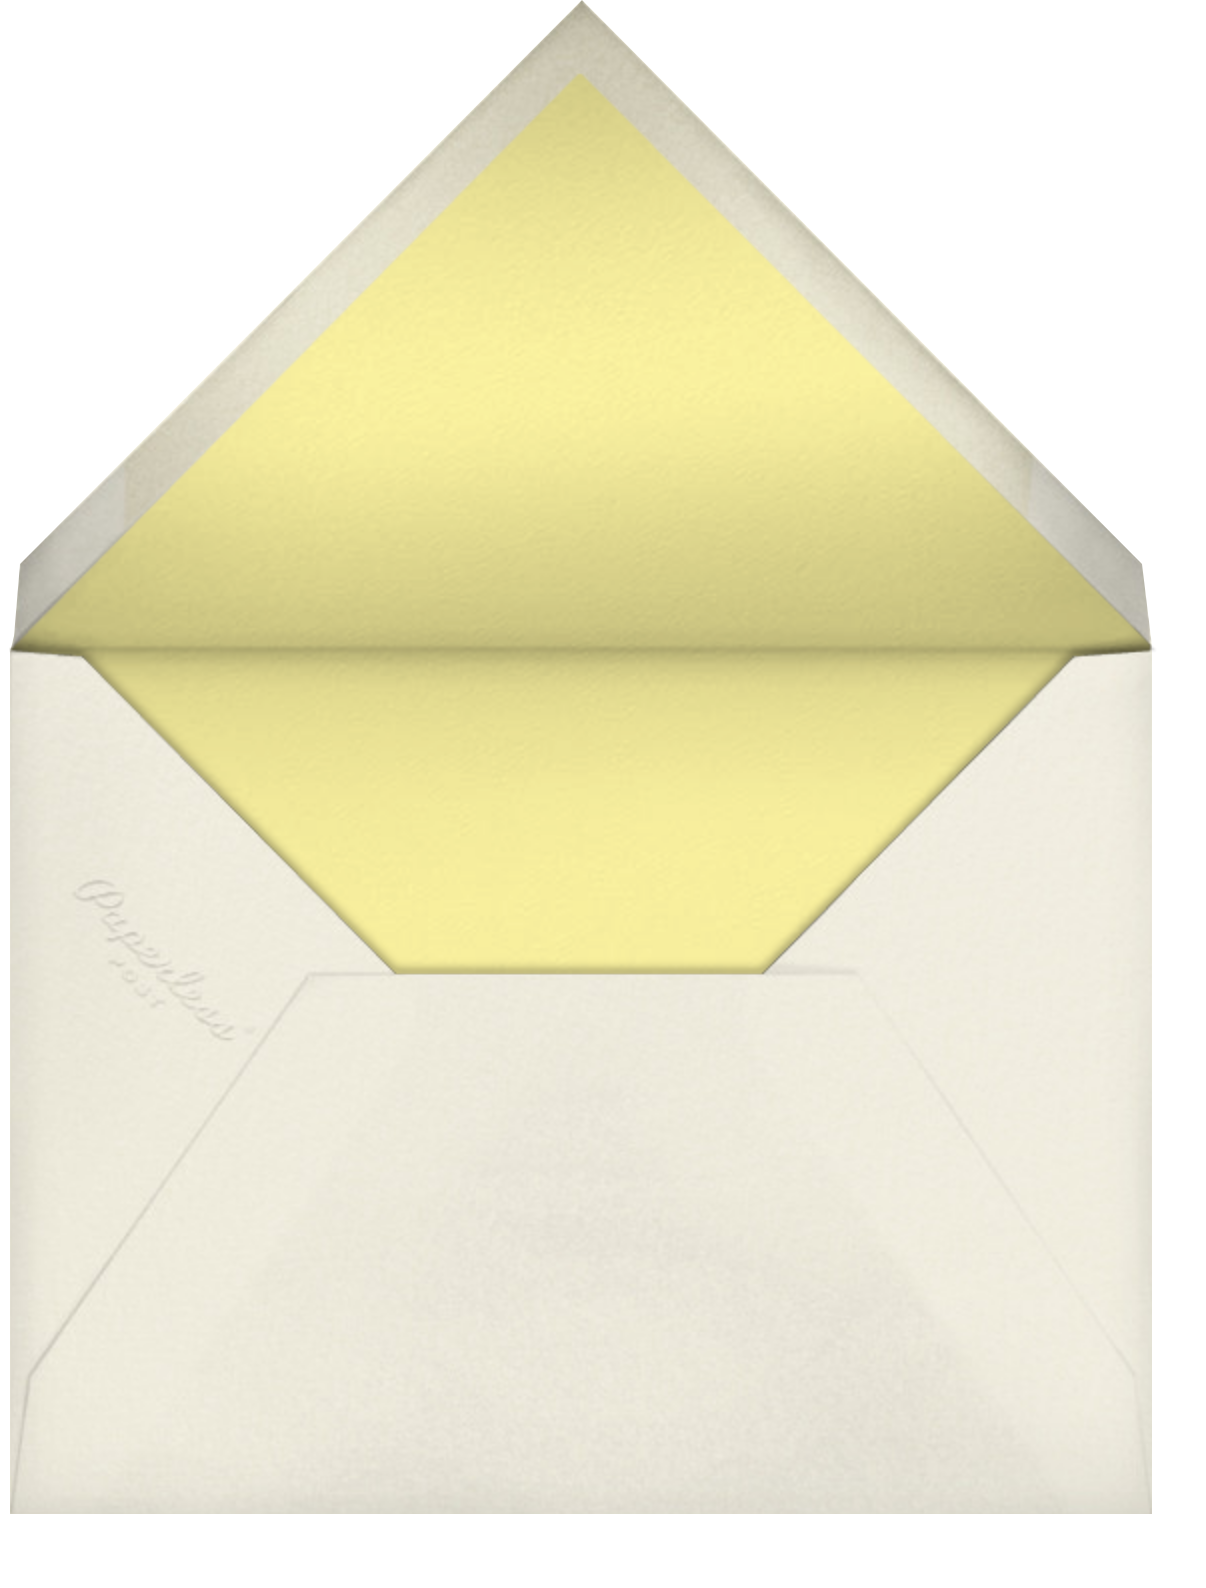 Citrus Primavera - Oscar de la Renta - Envelope